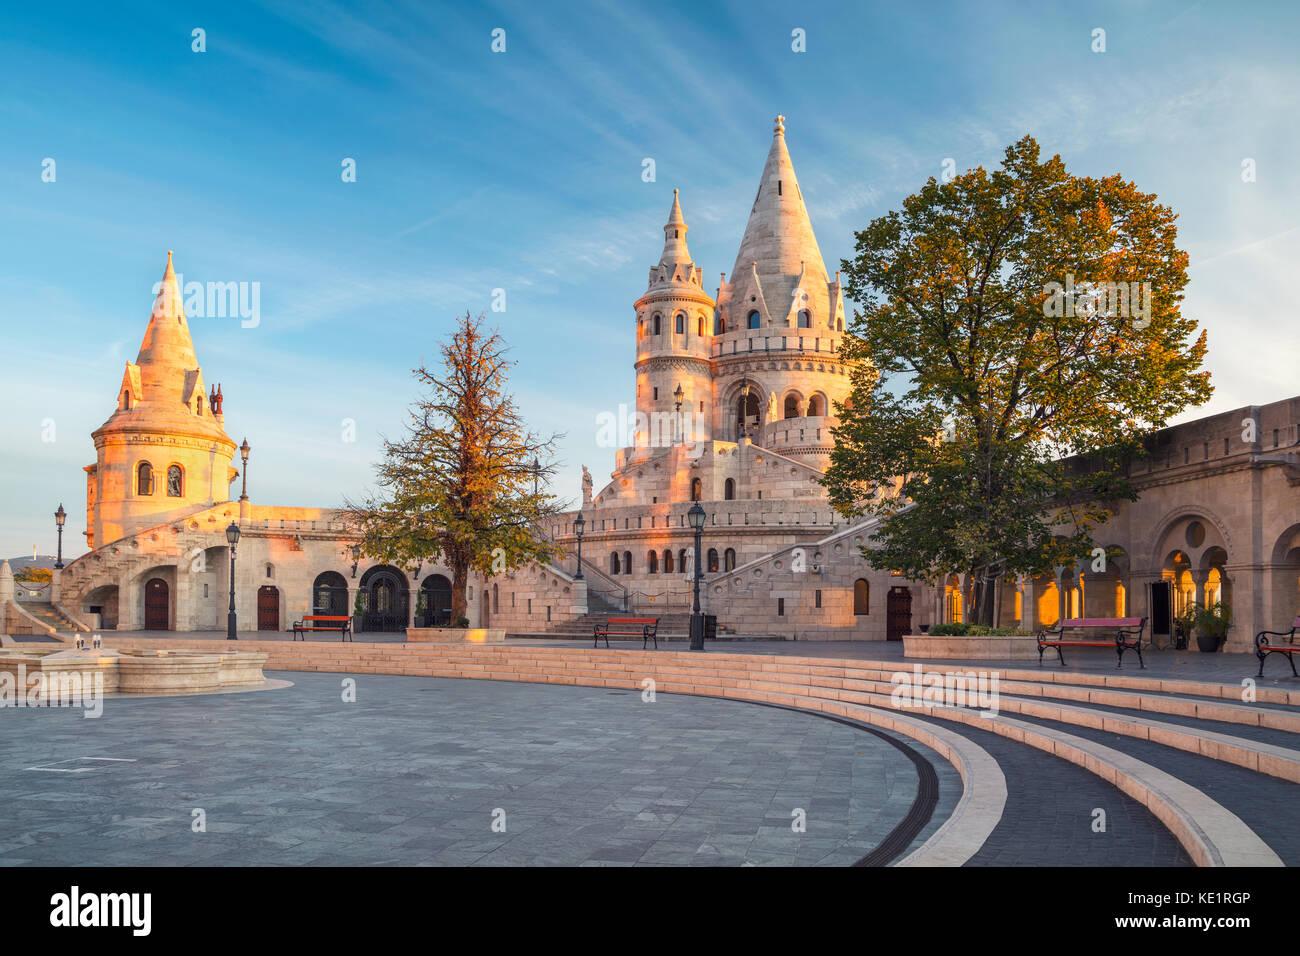 Fisherman's Bastion, Budapest. Image of the Fisherman's Bastion in Budapest, capital city of Hungary, during - Stock Image